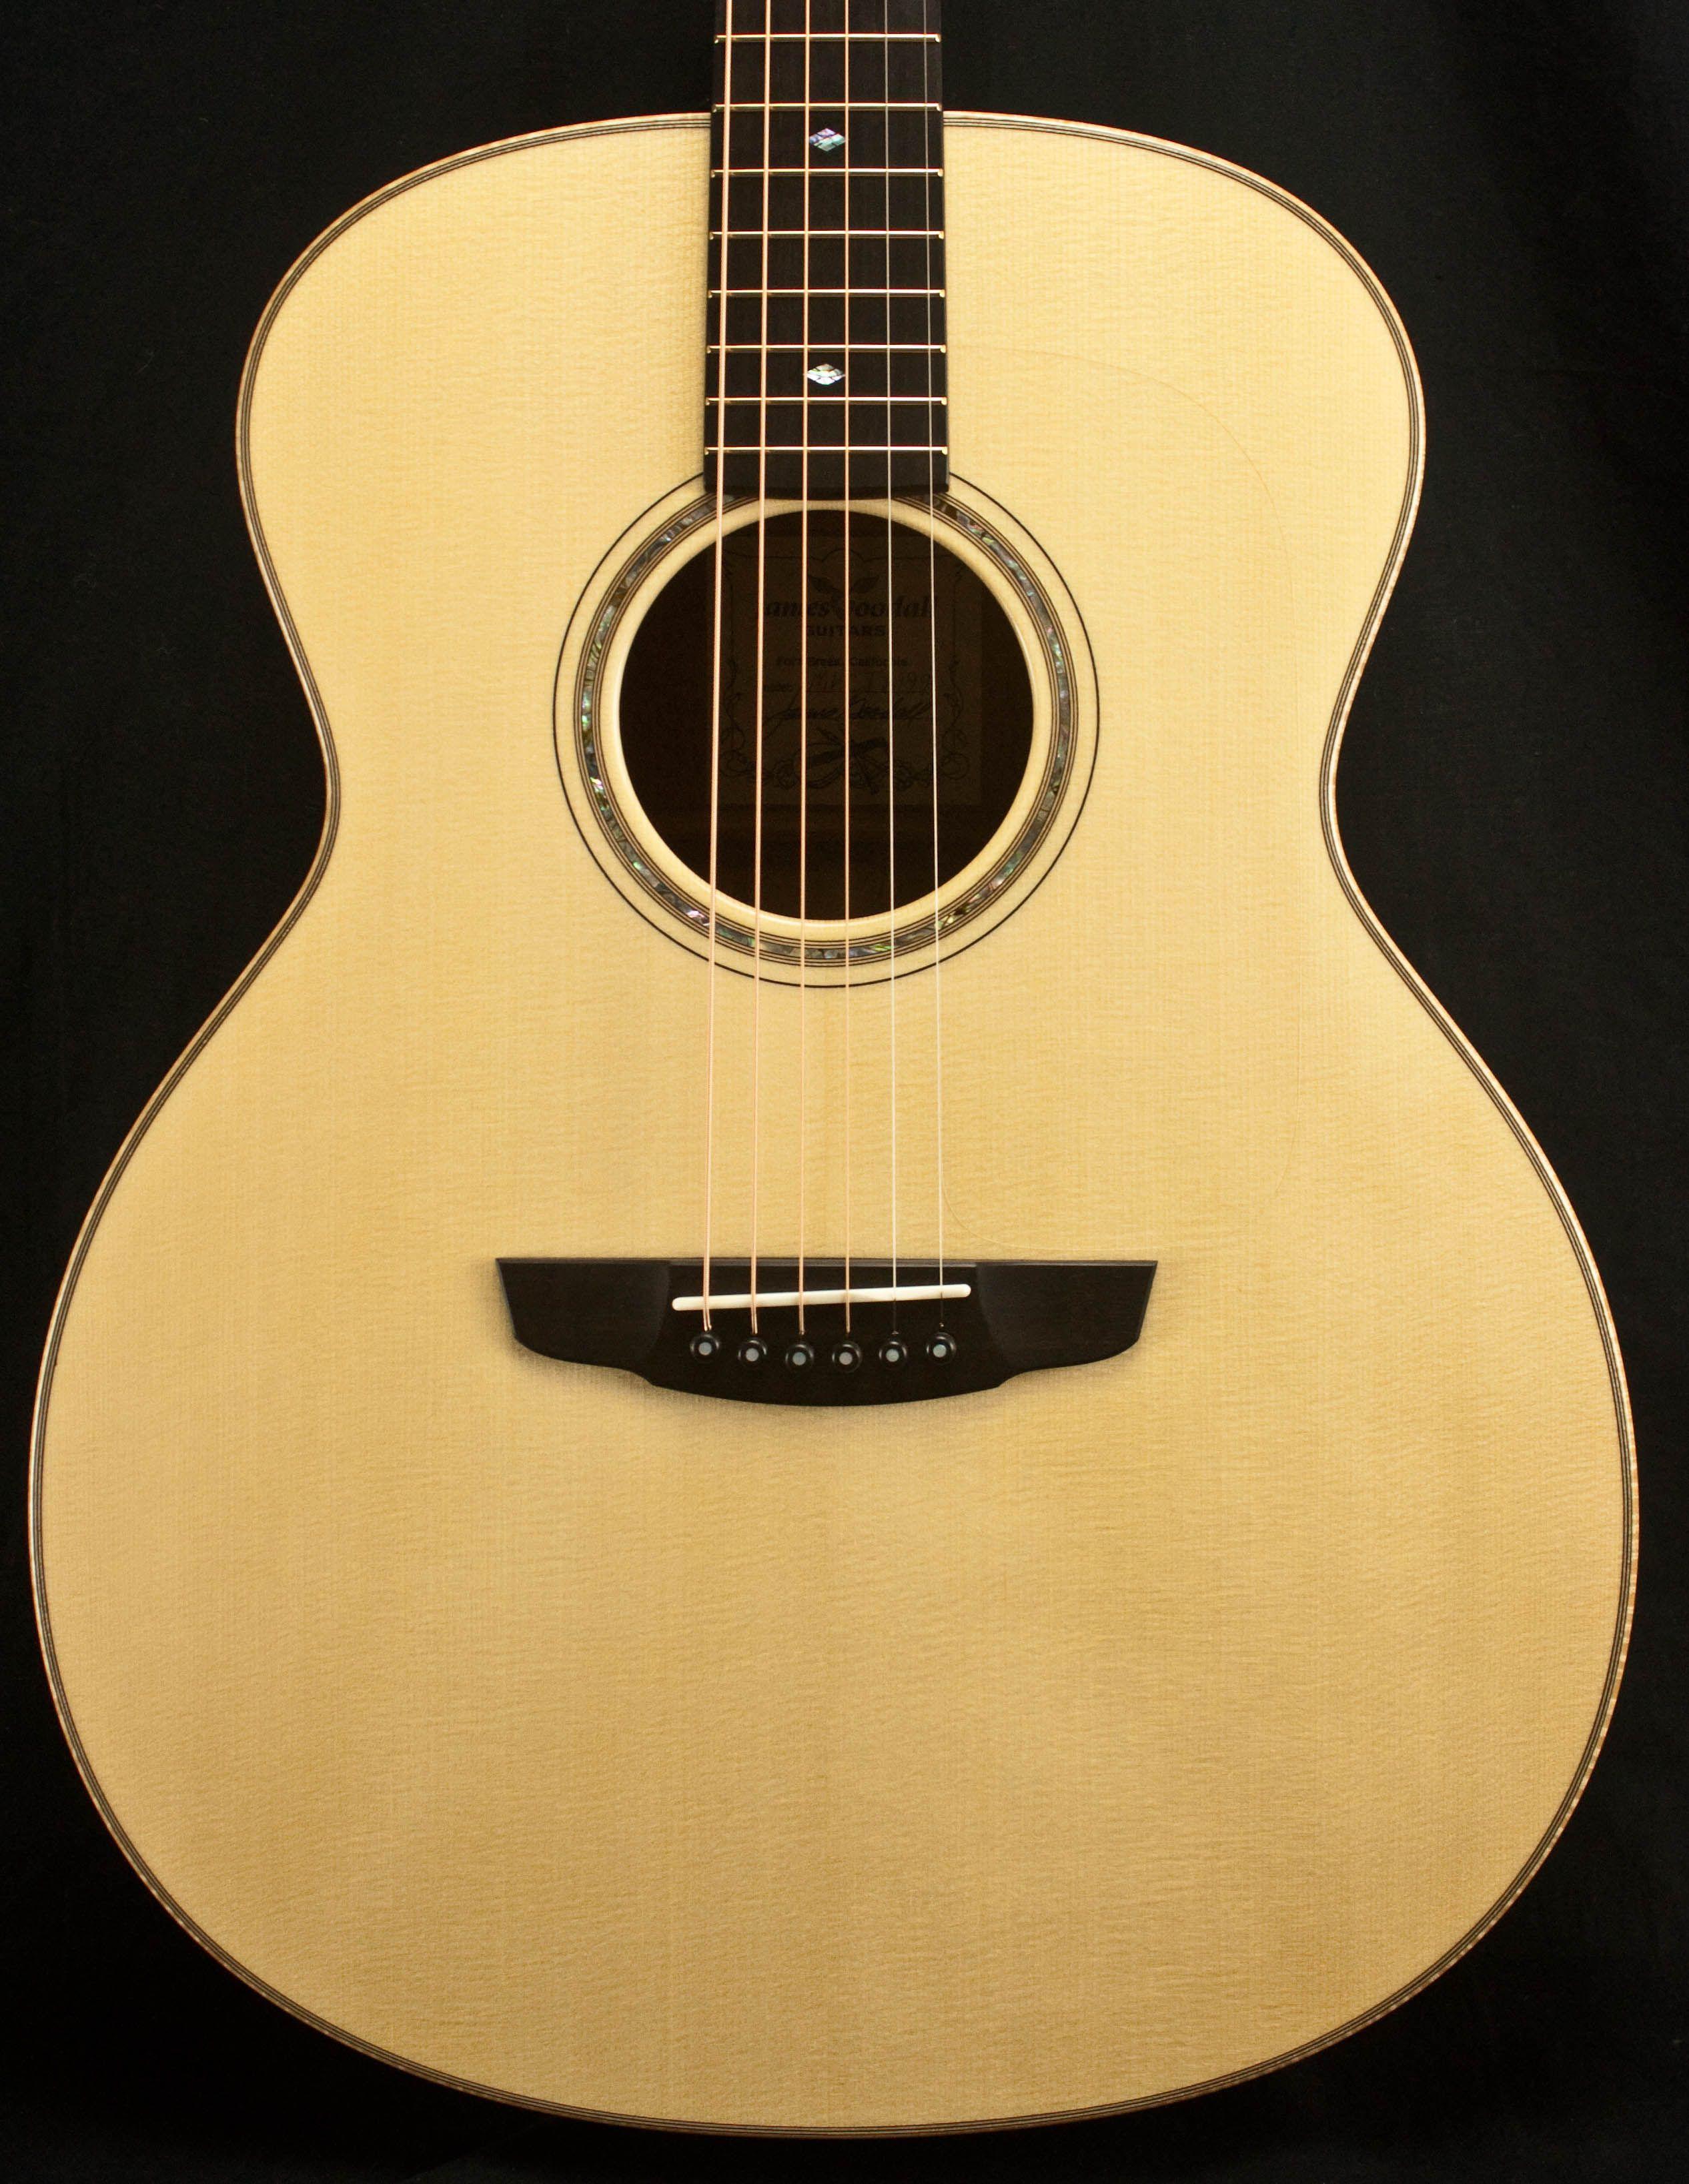 Goodall Mahogany Concert Jumbo Acoustic Guitar Soundpure Com Guitar Acoustic Guitar Acoustic